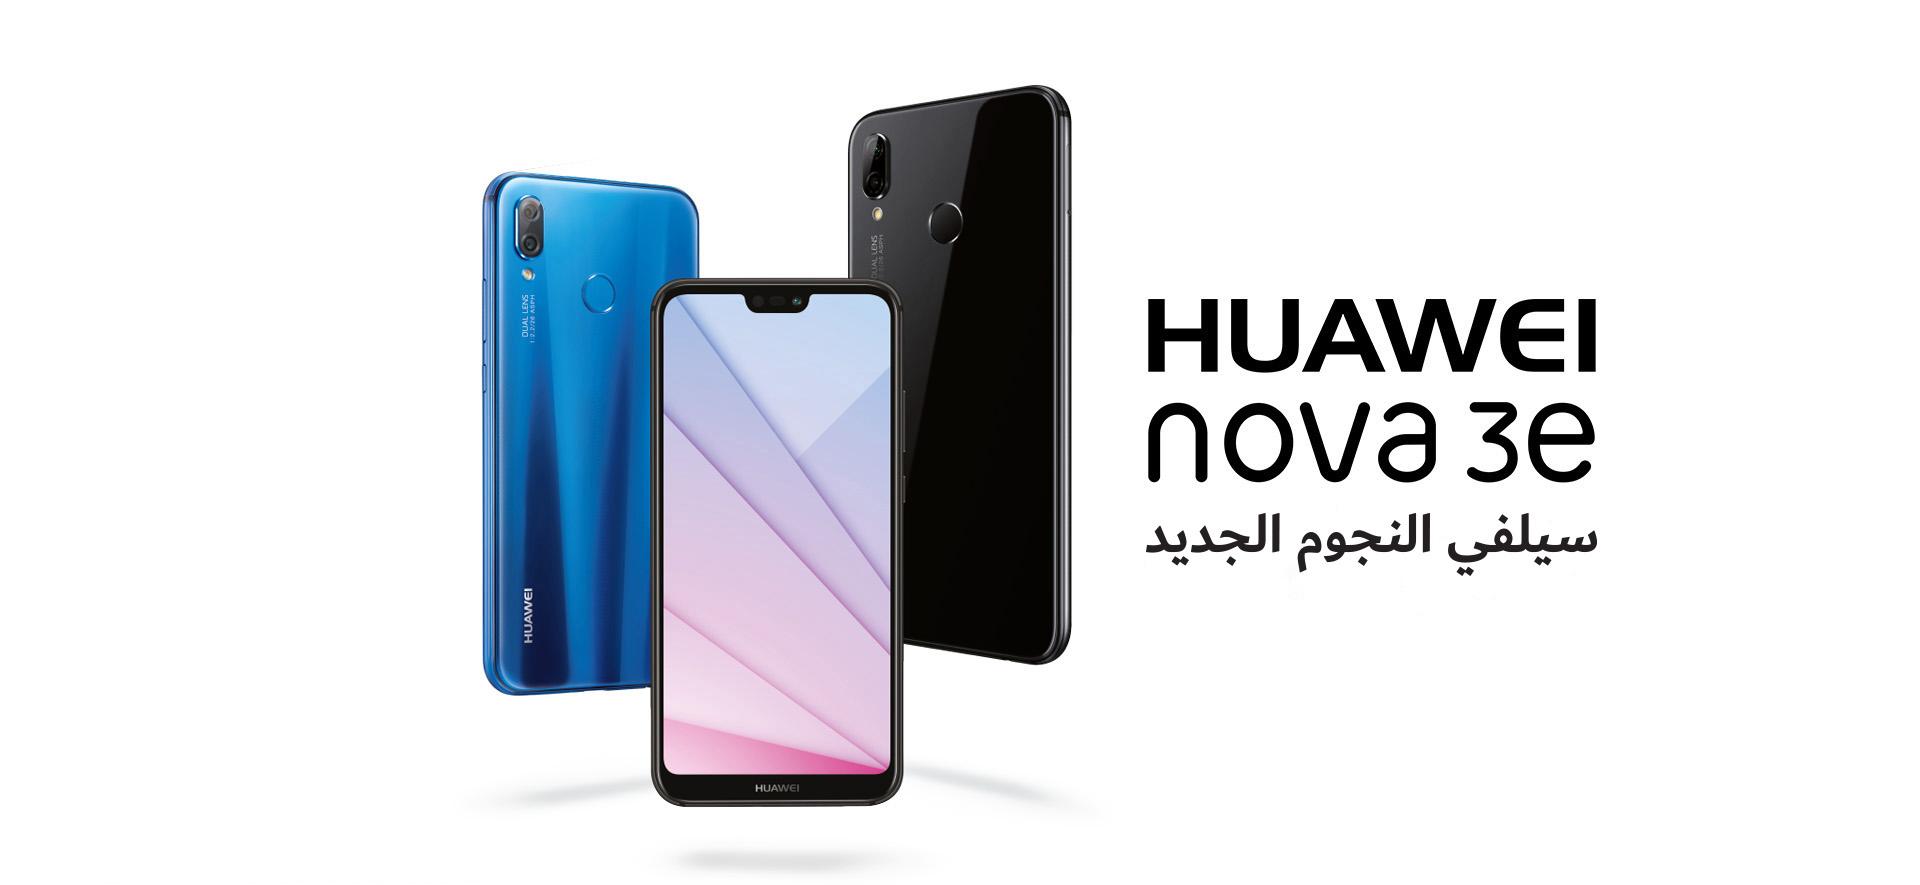 HUAWEI nova 3e back and front display